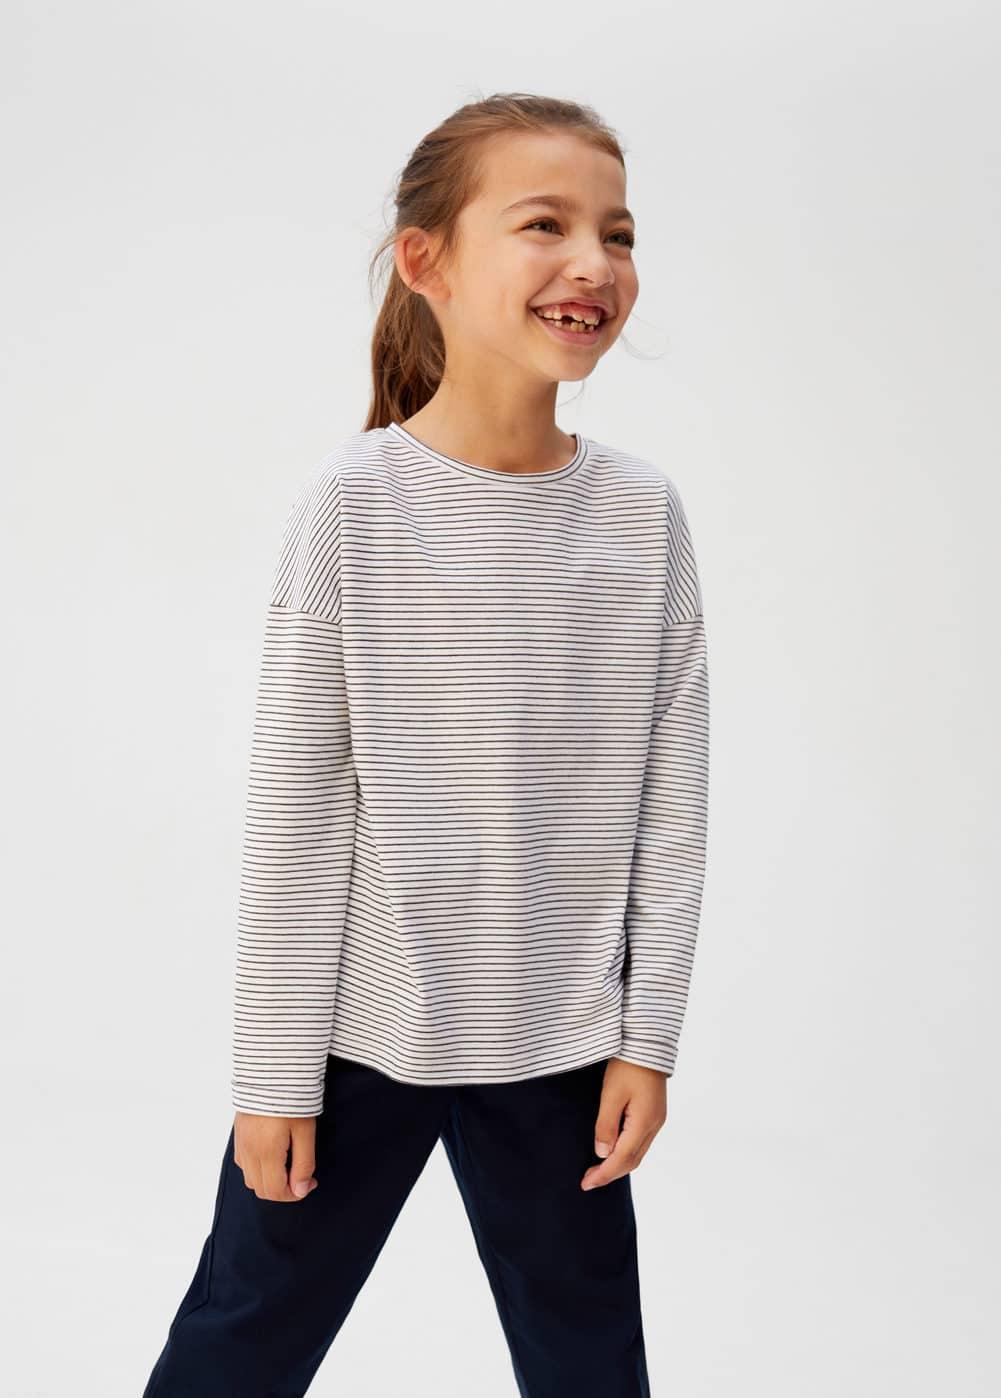 a-vinilo:camiseta algodon organico rayas